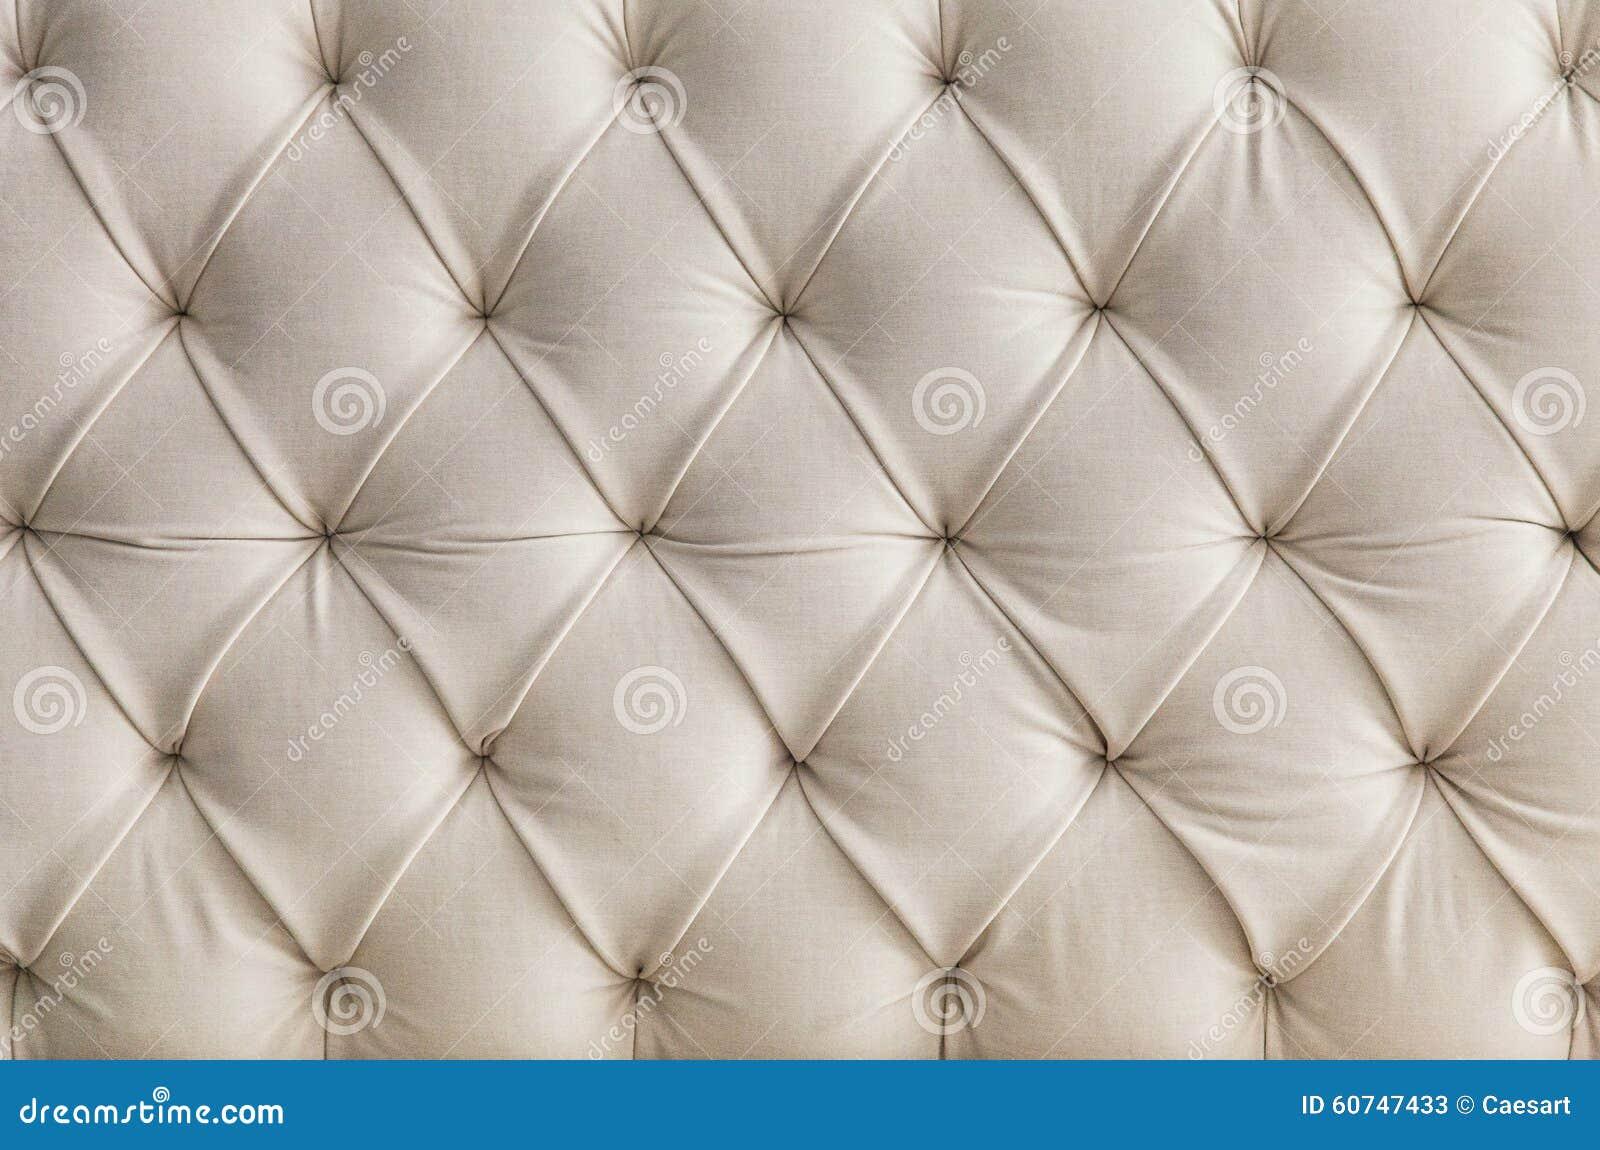 Light Upholstery White Sofa Texture Pattern Background Stock Image